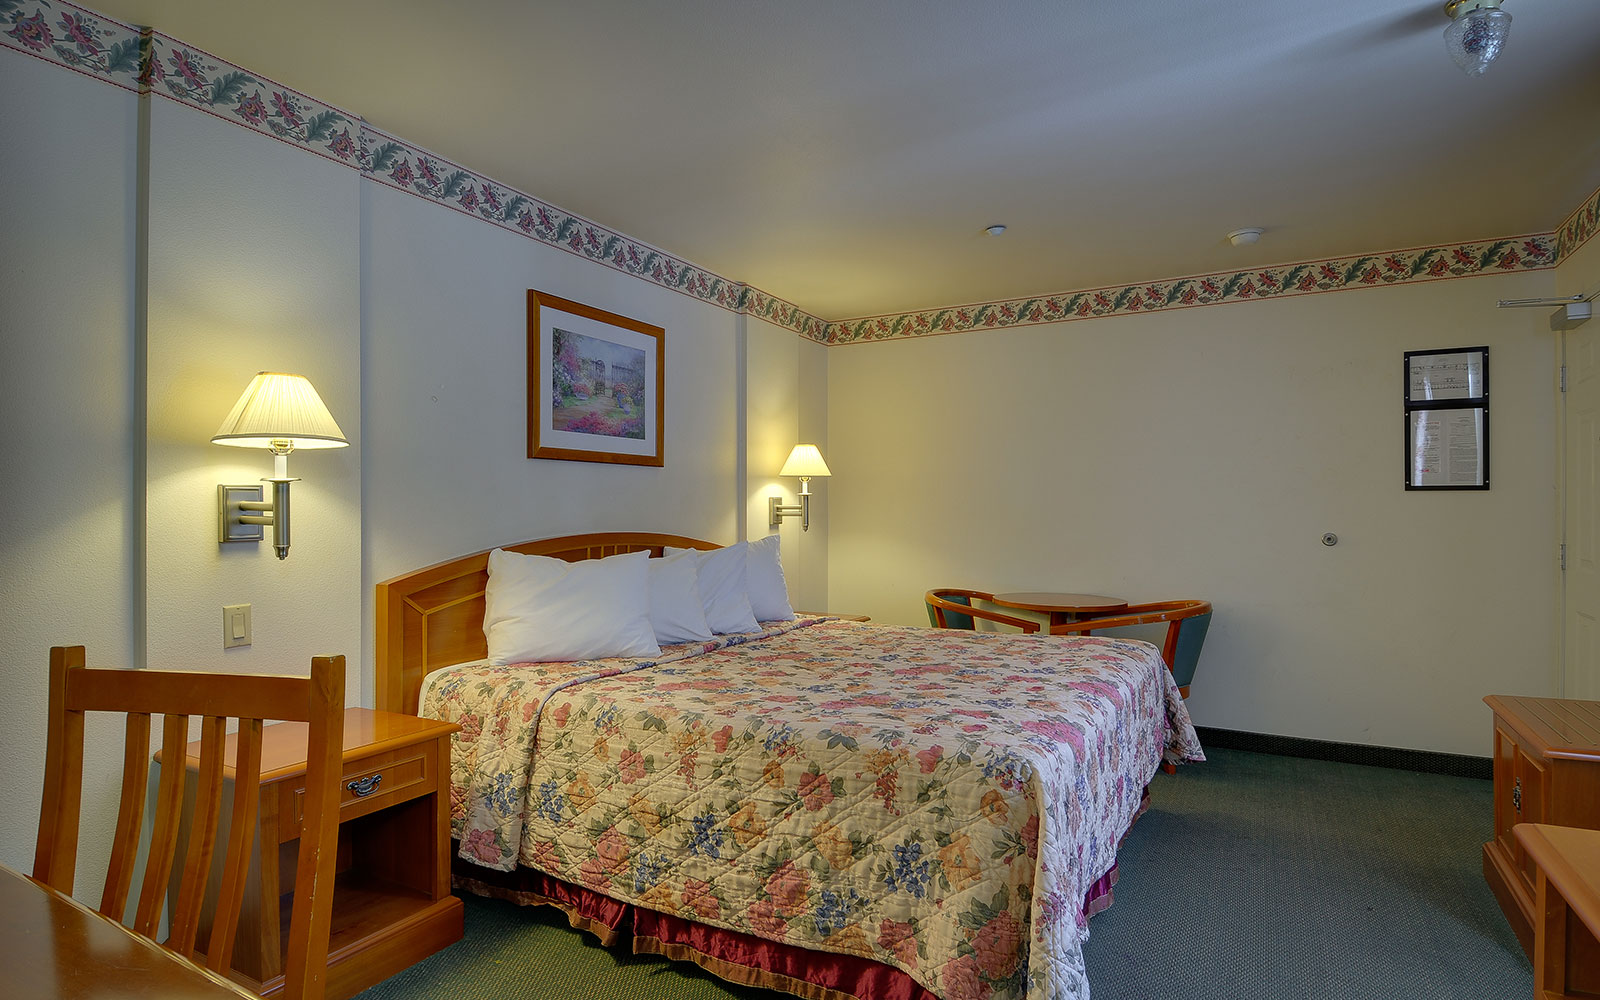 Oxnard Hotel Rooms